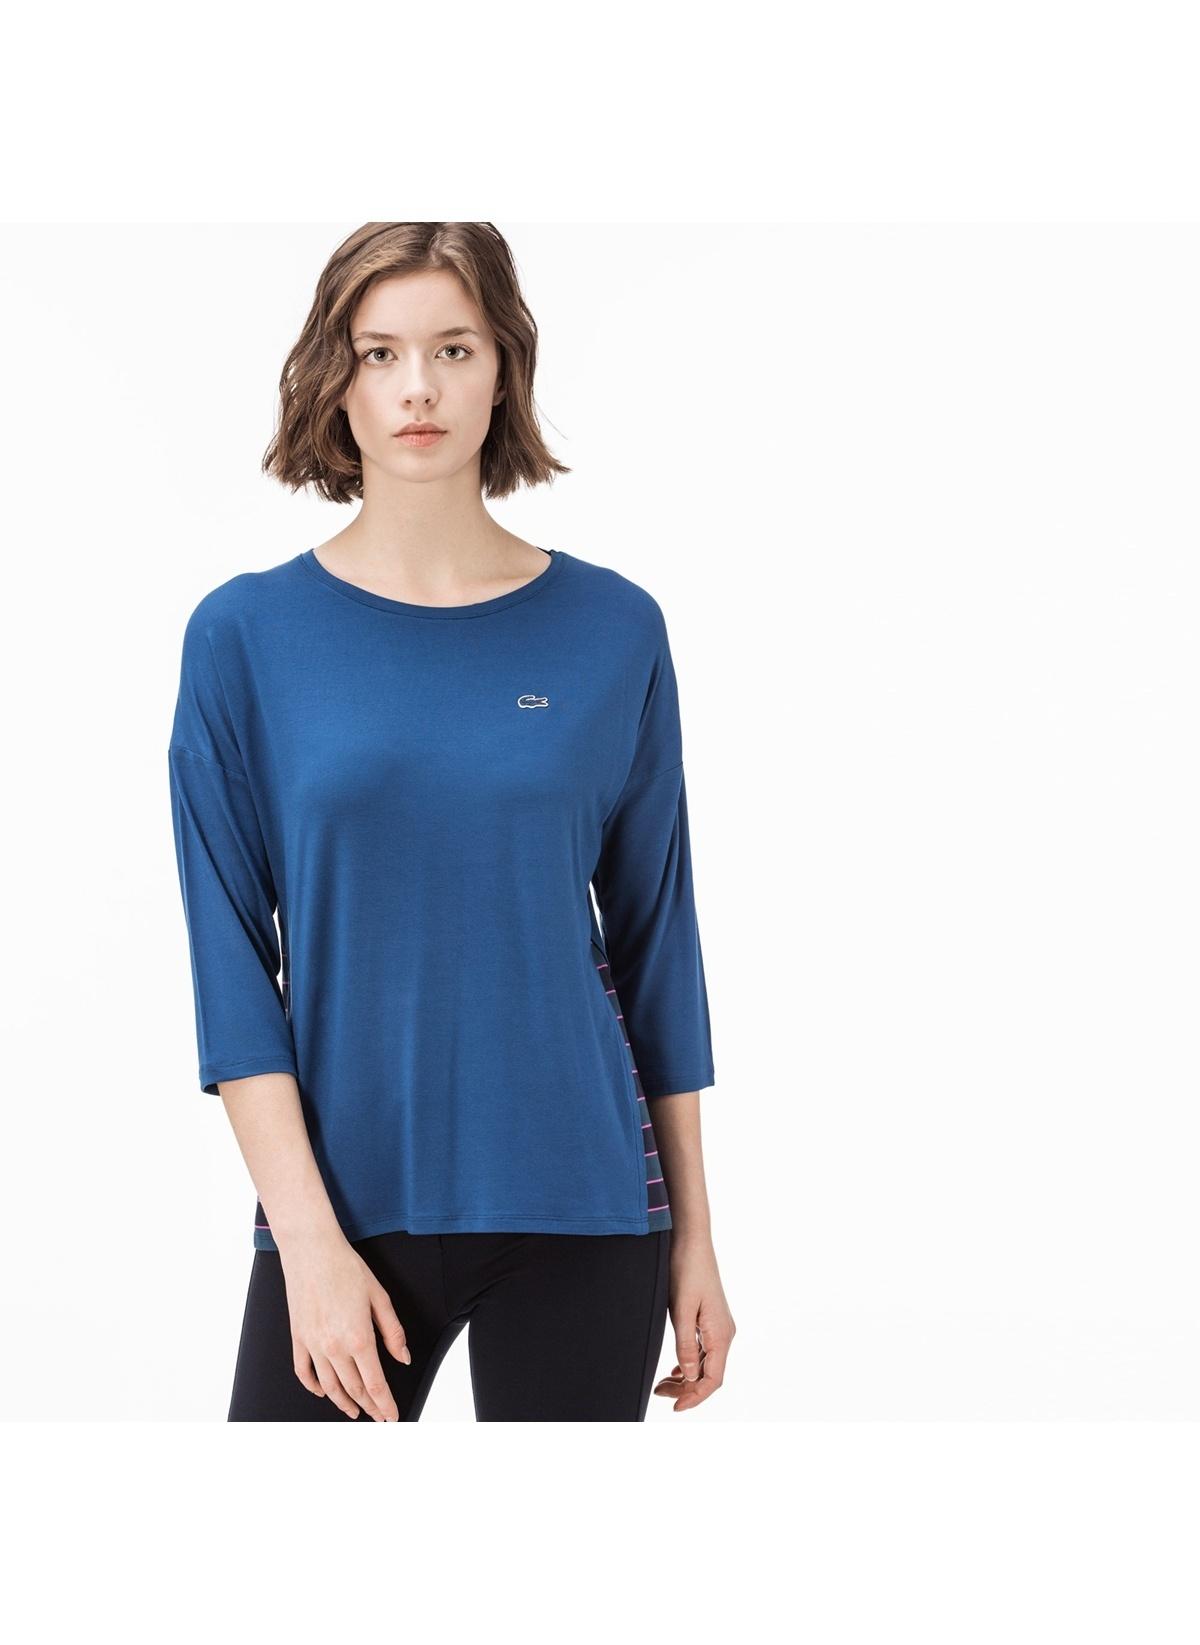 Lacoste Tişört Tf1902.02m T-shirt – 247.0 TL